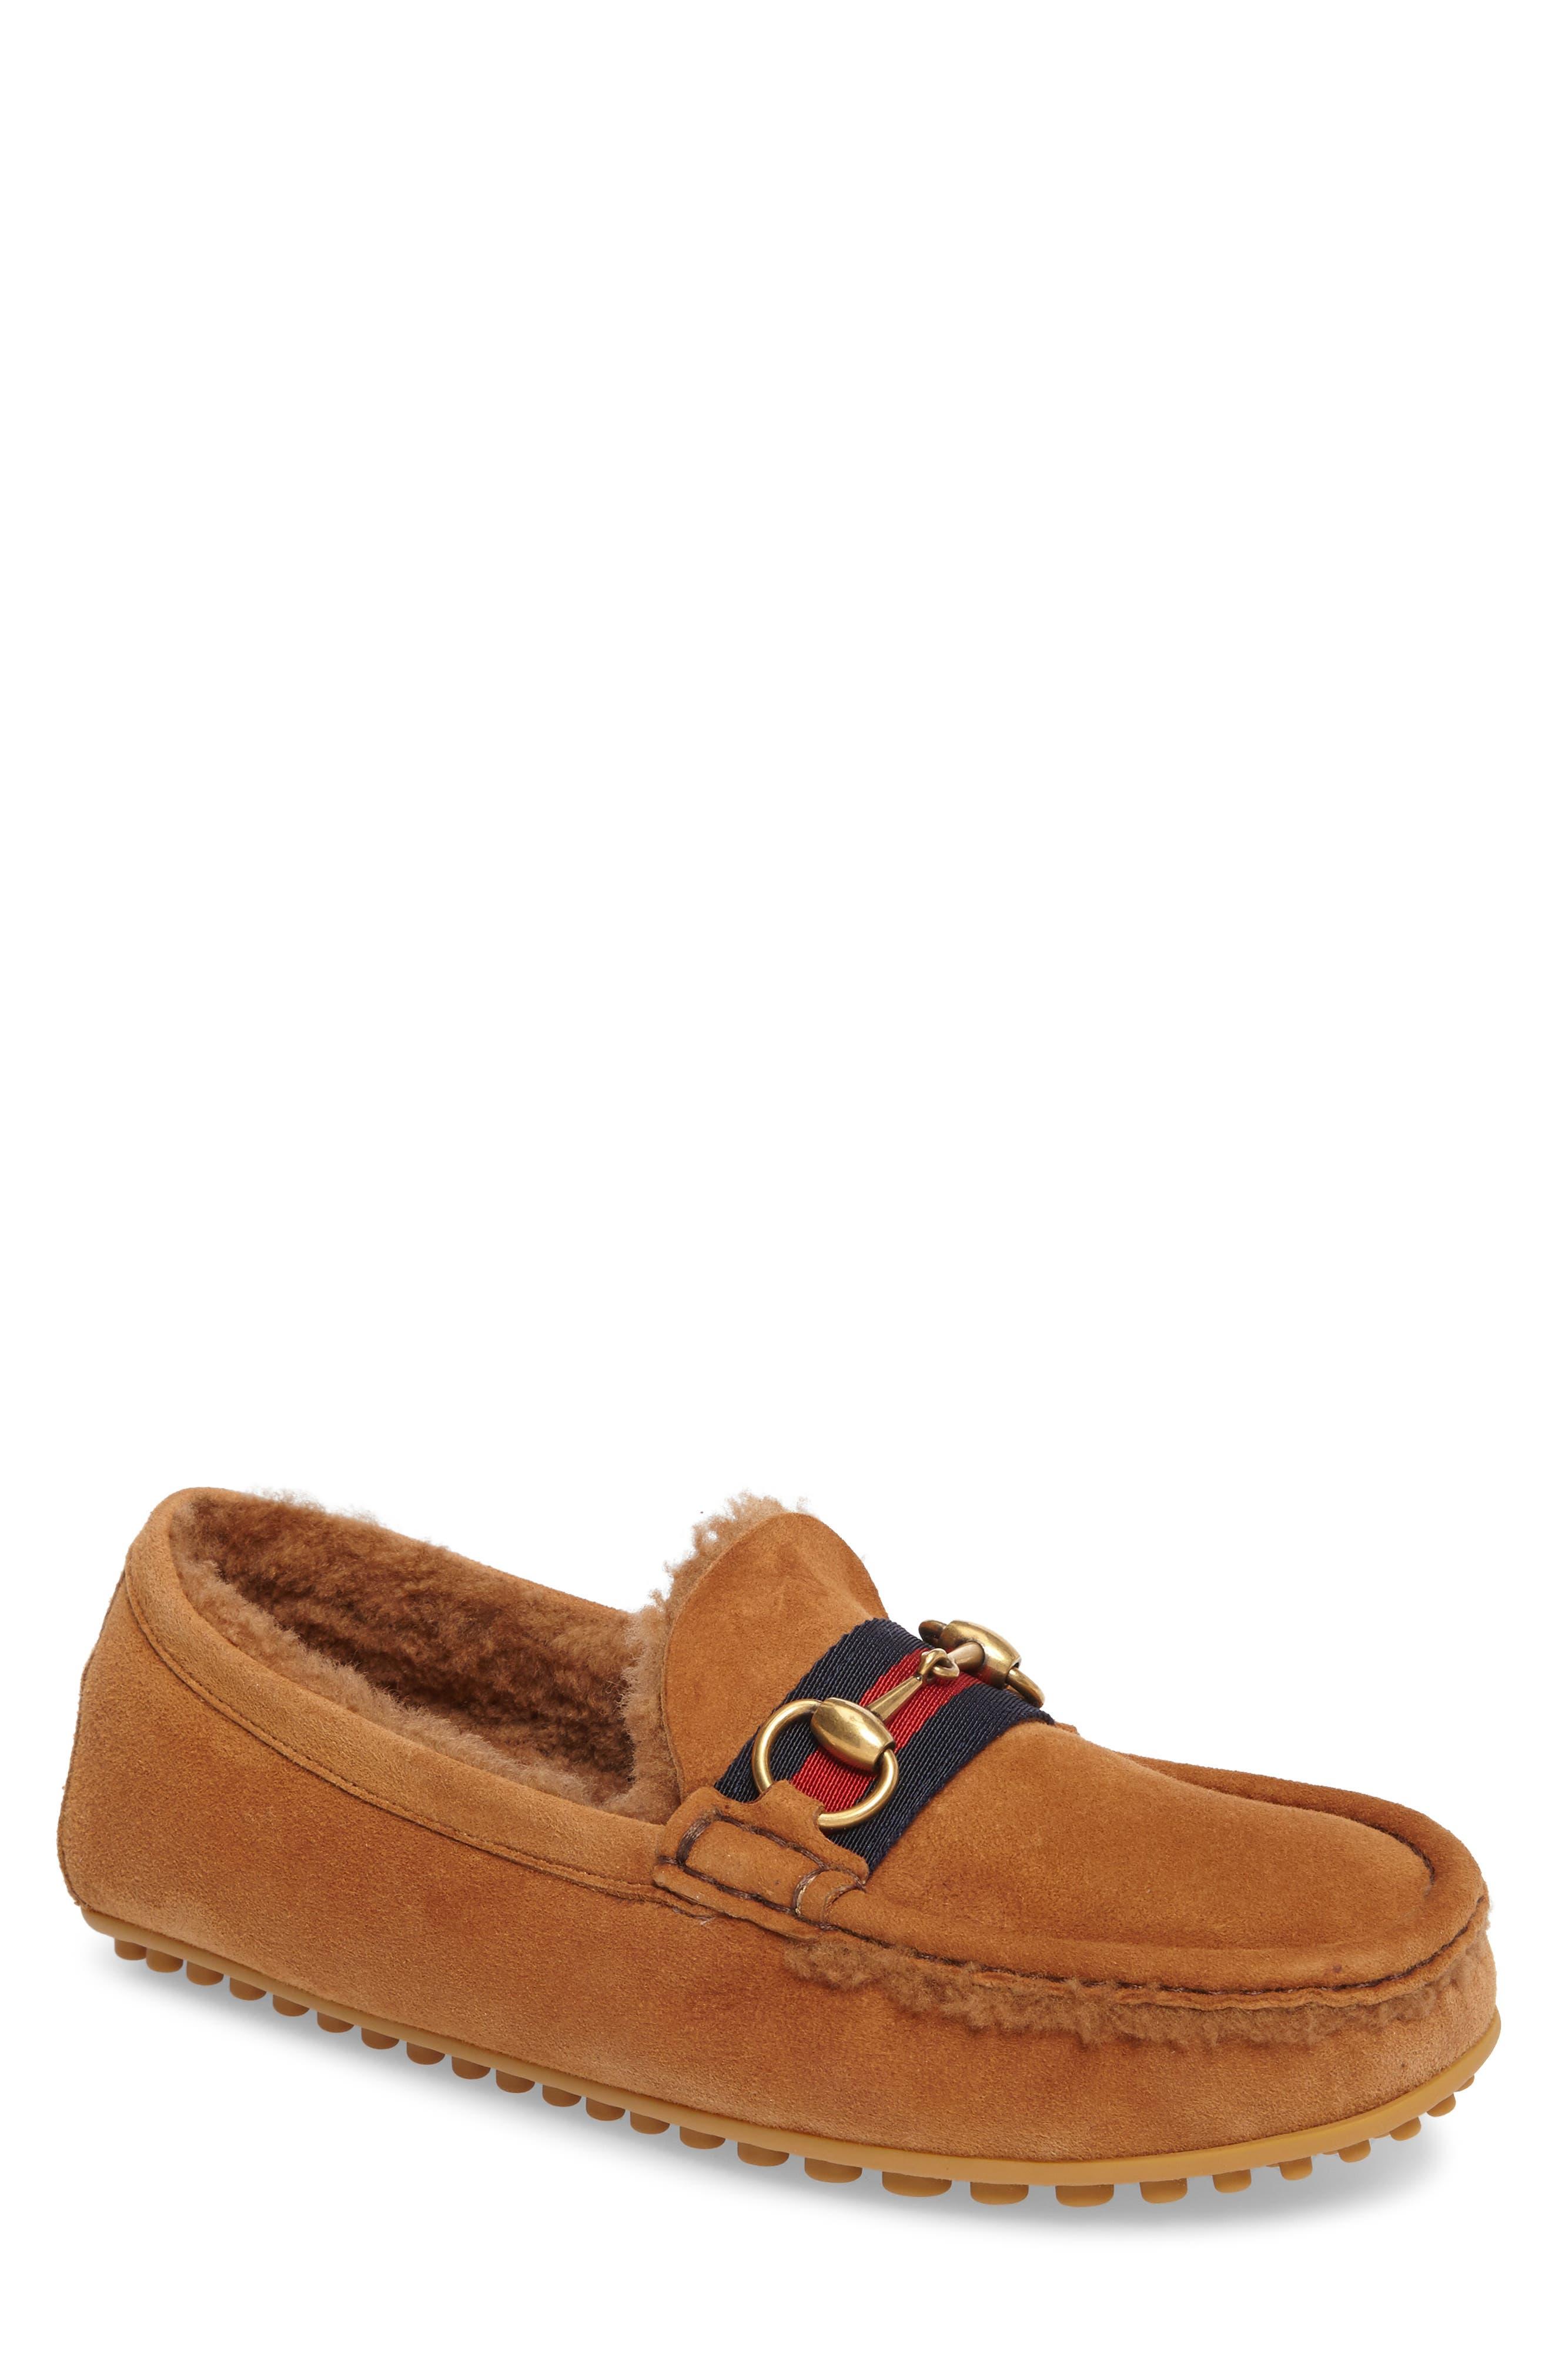 Driving Shoe with Genuine Shearling,                         Main,                         color, Dark Tan